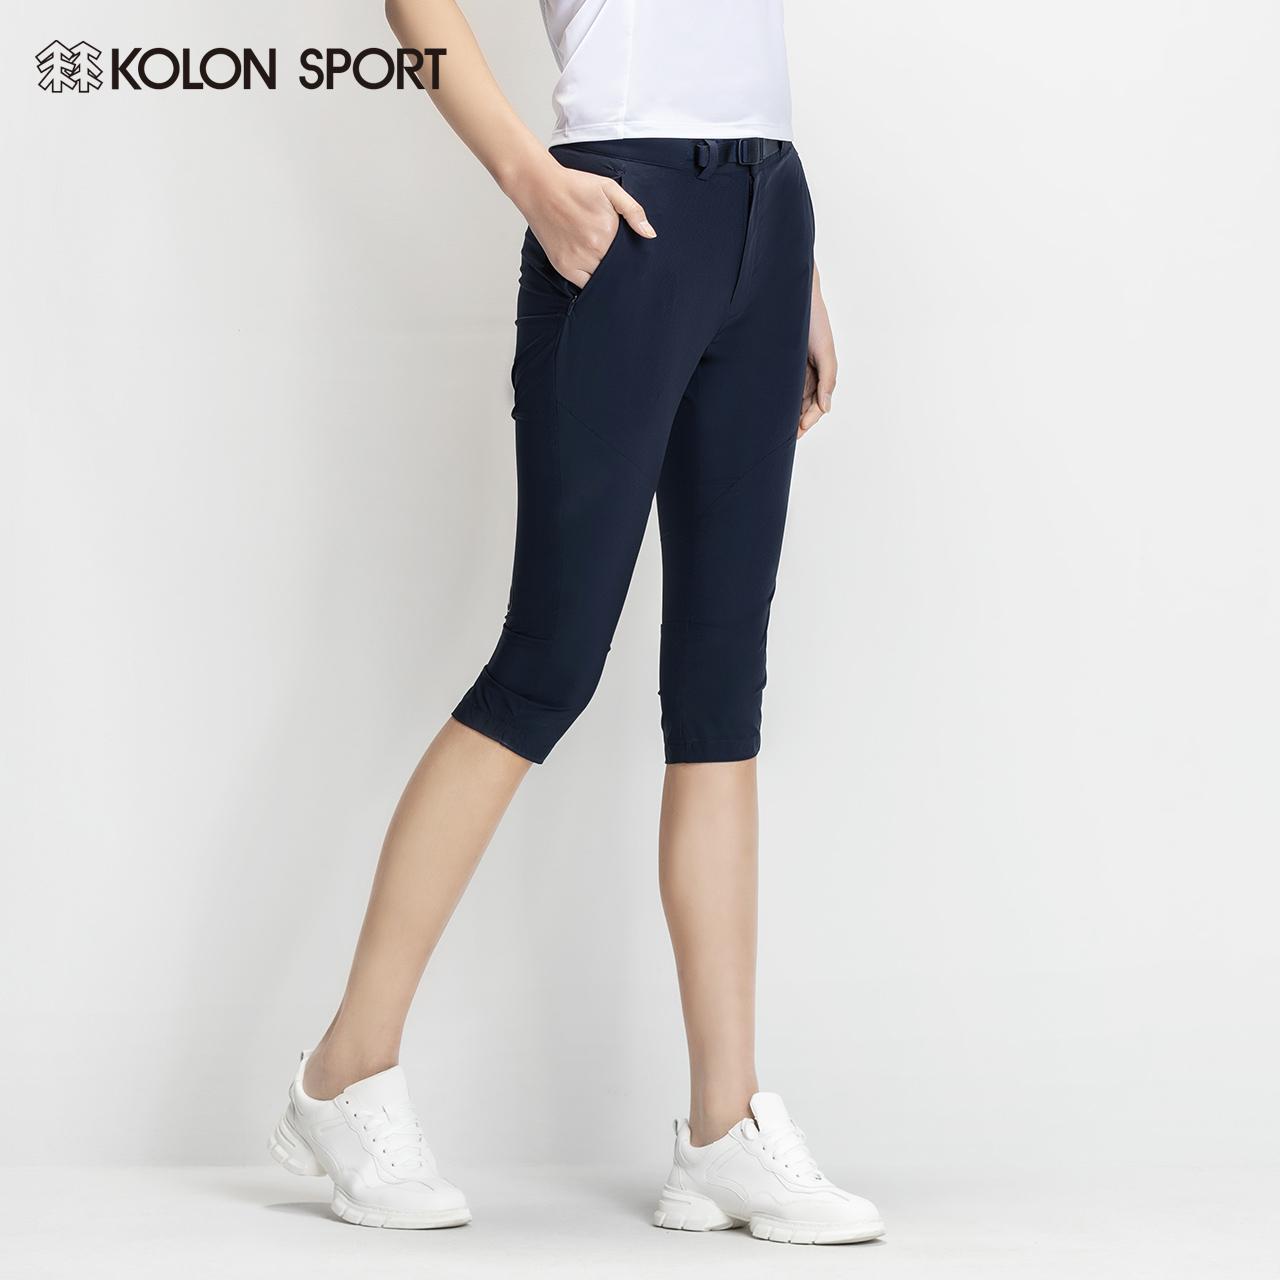 KOLONSPORT可隆裤子女七分裤 2019夏新款吸汗透气户外运动短裤女